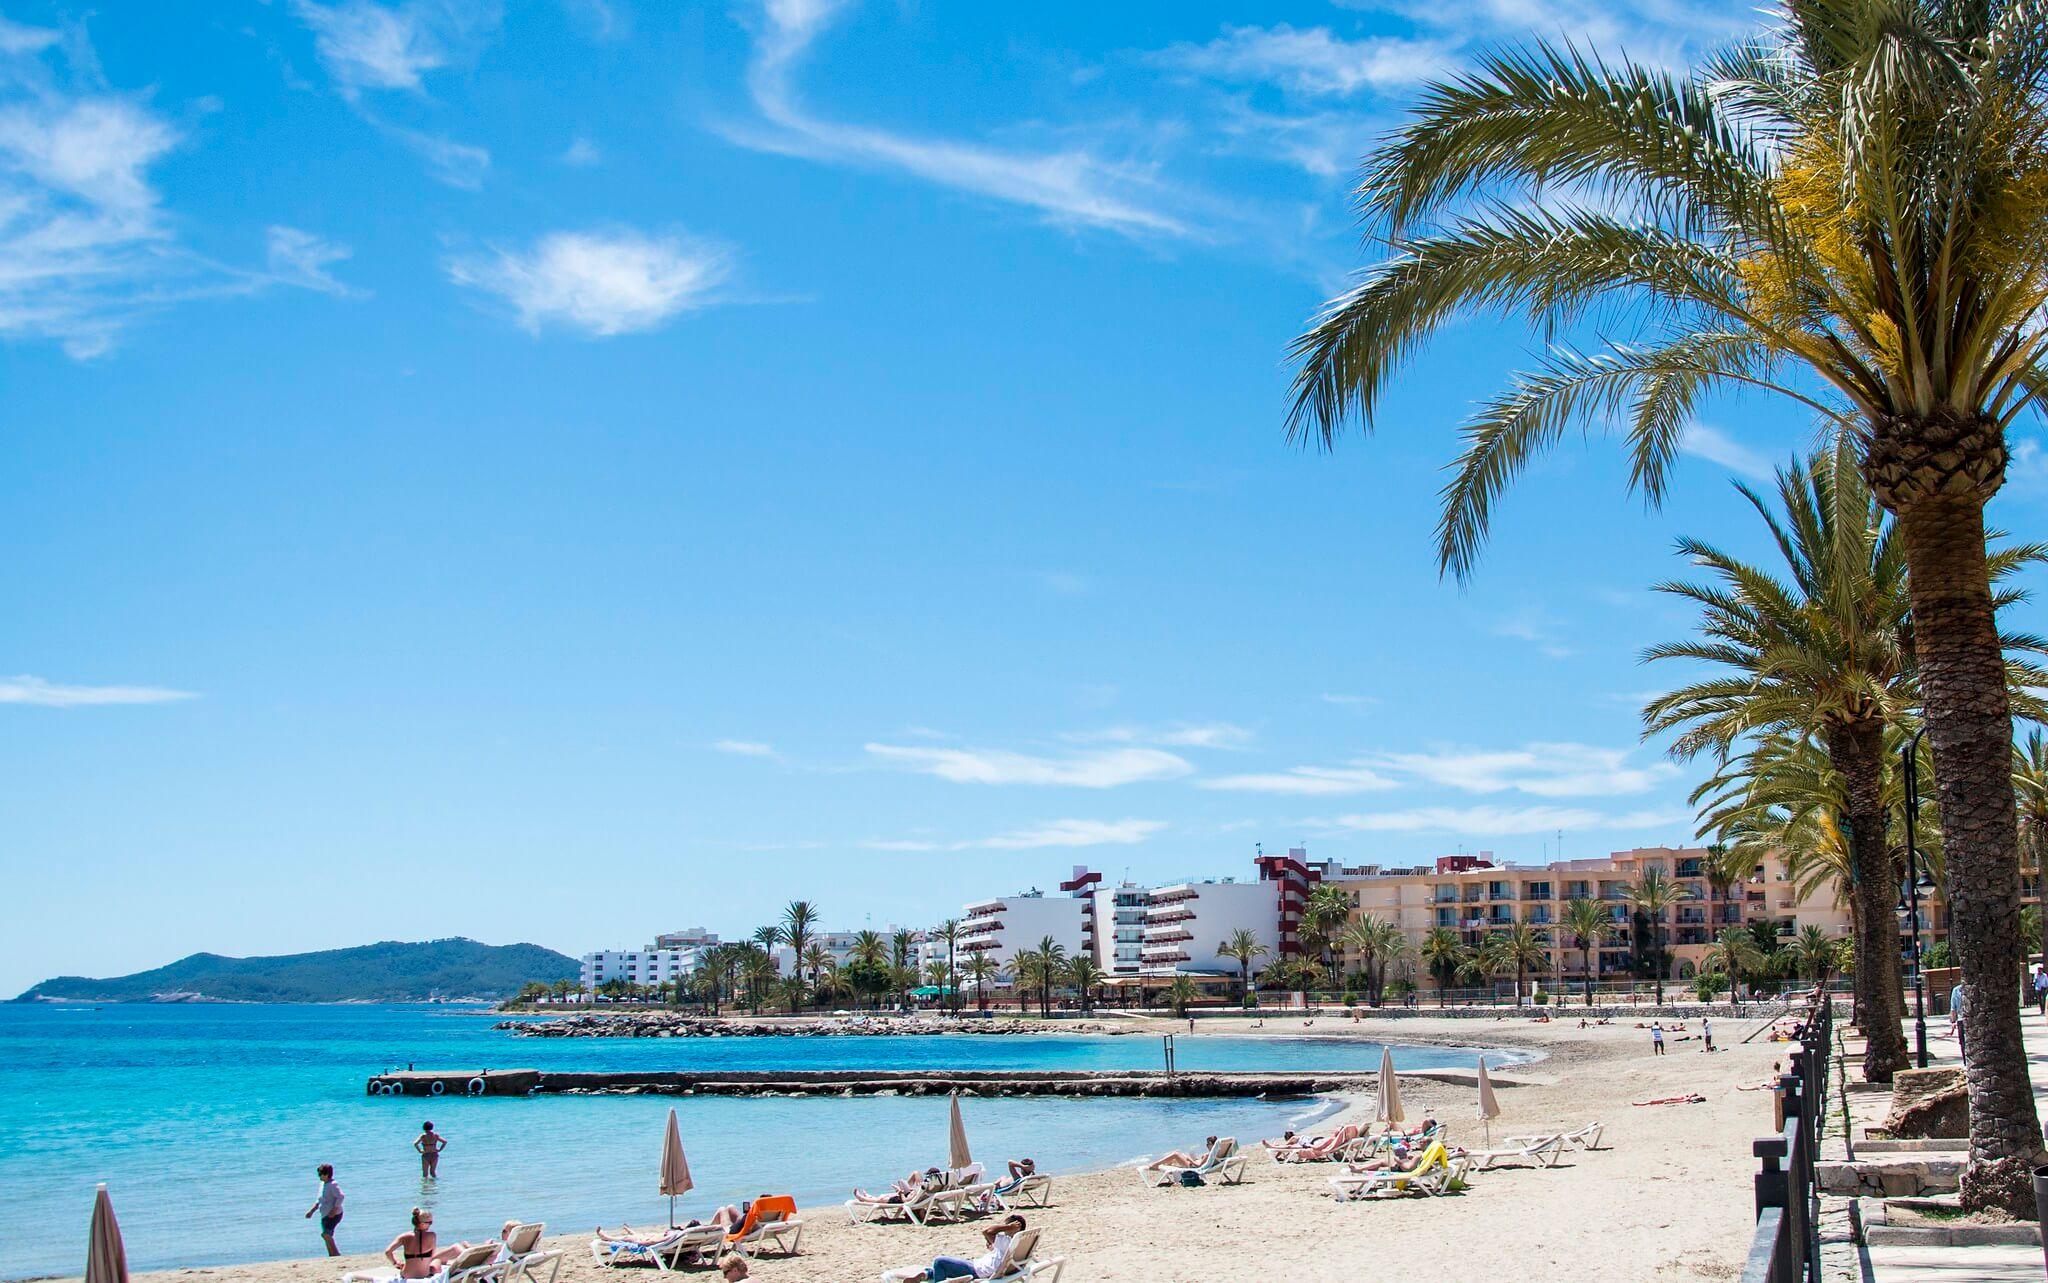 https://www.white-ibiza.com/wp-content/uploads/2020/03/ibiza-beaches-figueretas-06.jpg